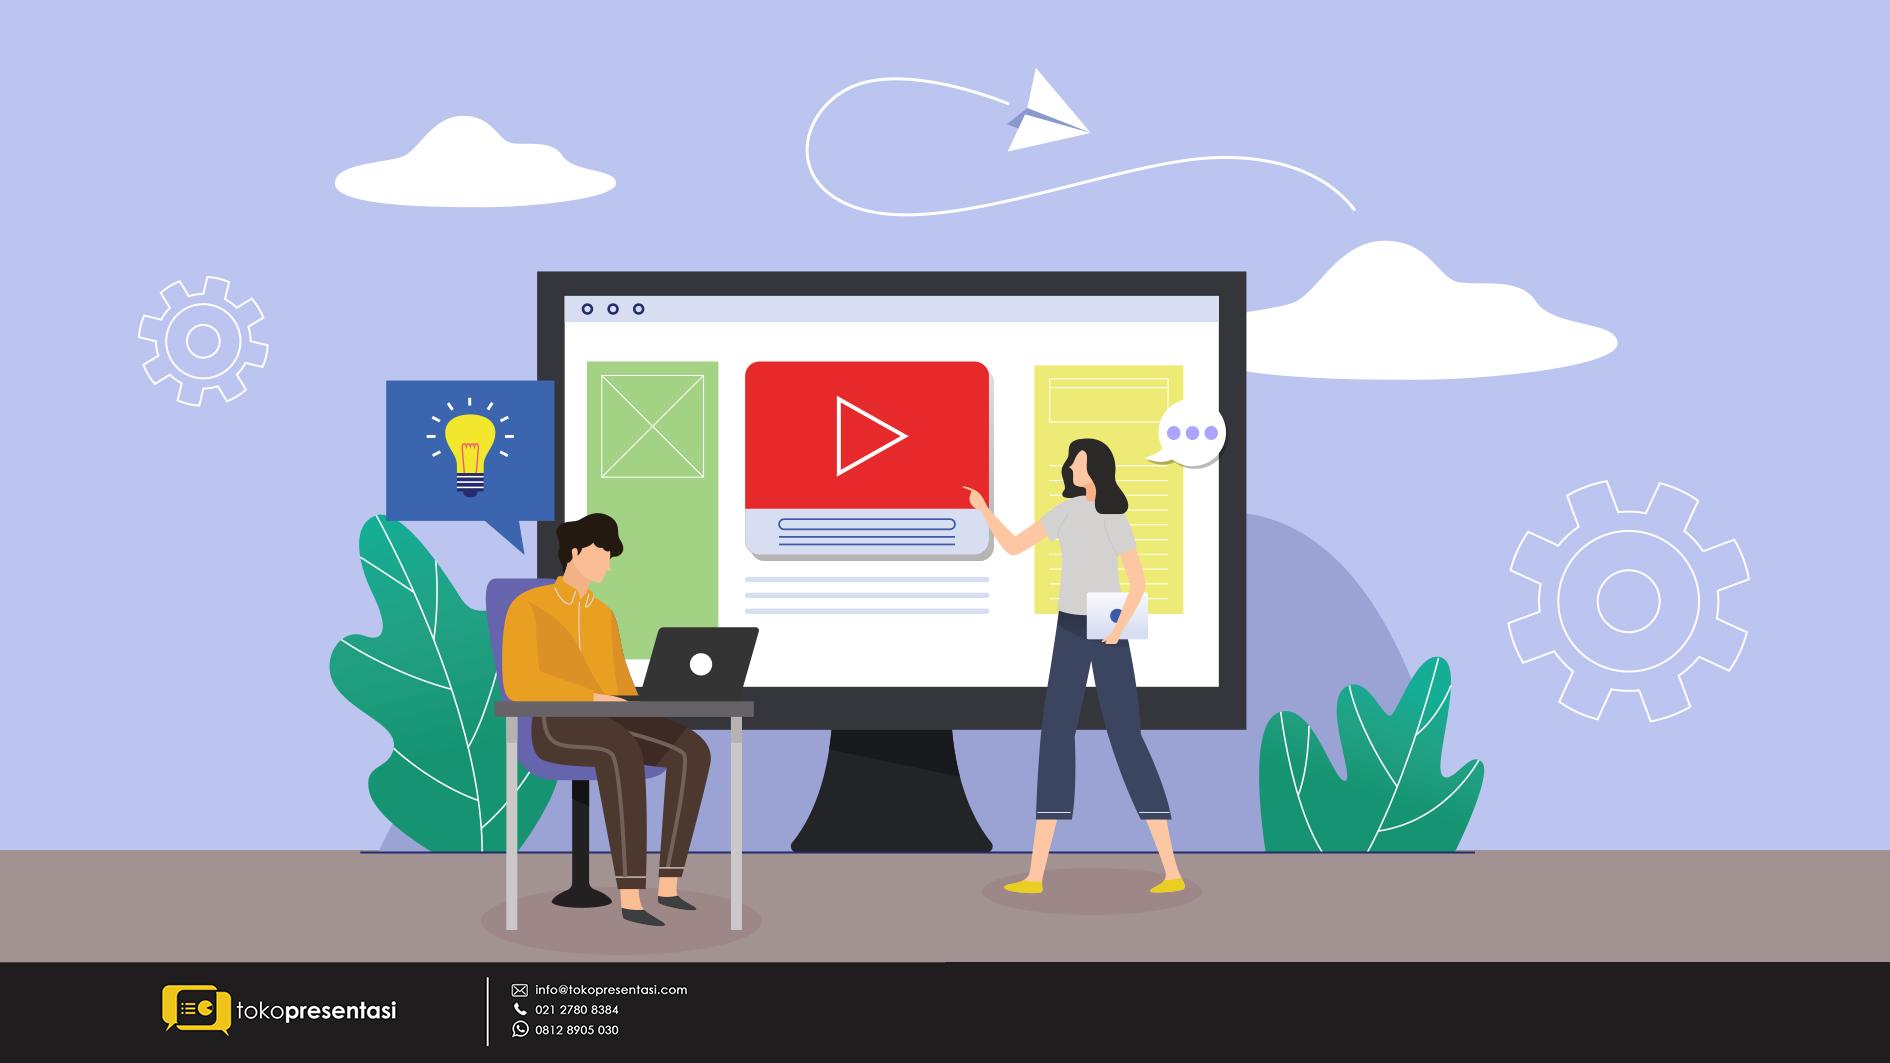 Manfaat Video Explainer bagi Keperluan Bisnismu - Tokopresentasi